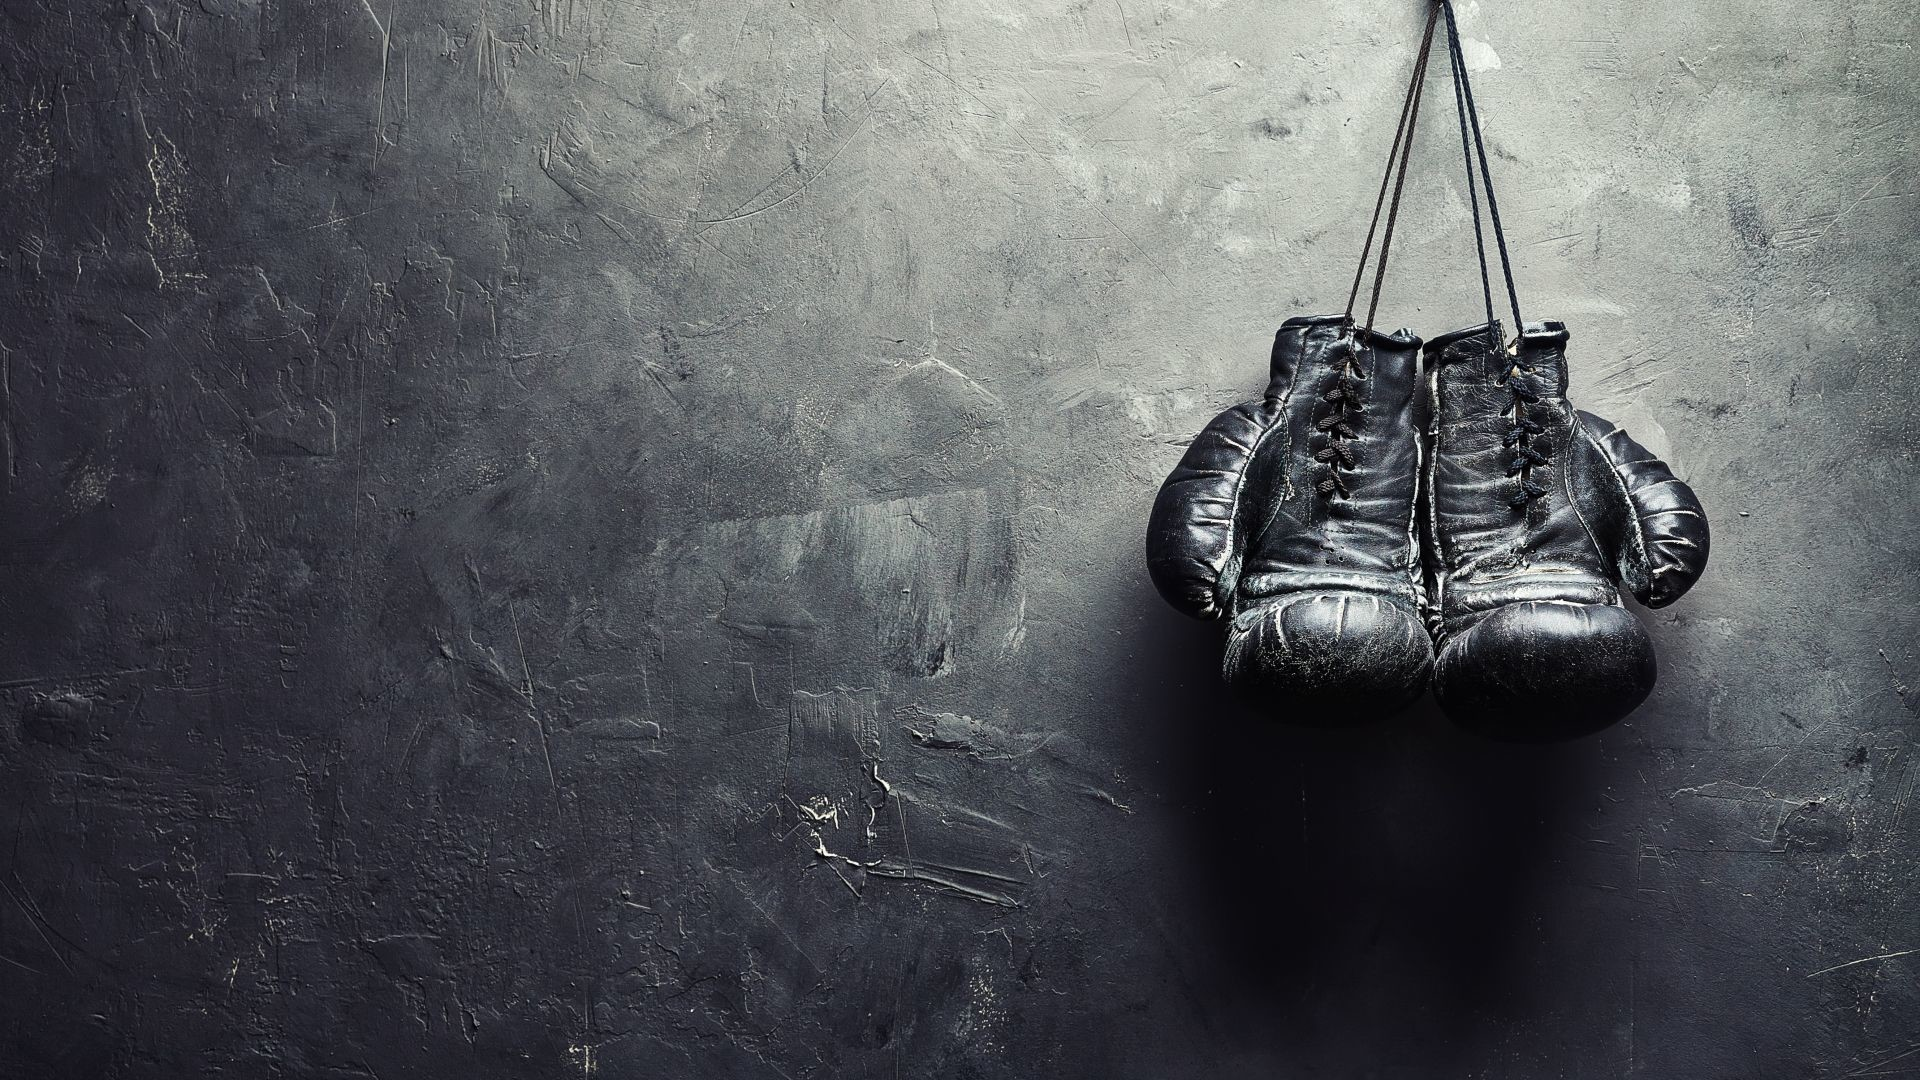 Res: 1920x1080, Boxing Gloves Wallpaper Full HD.